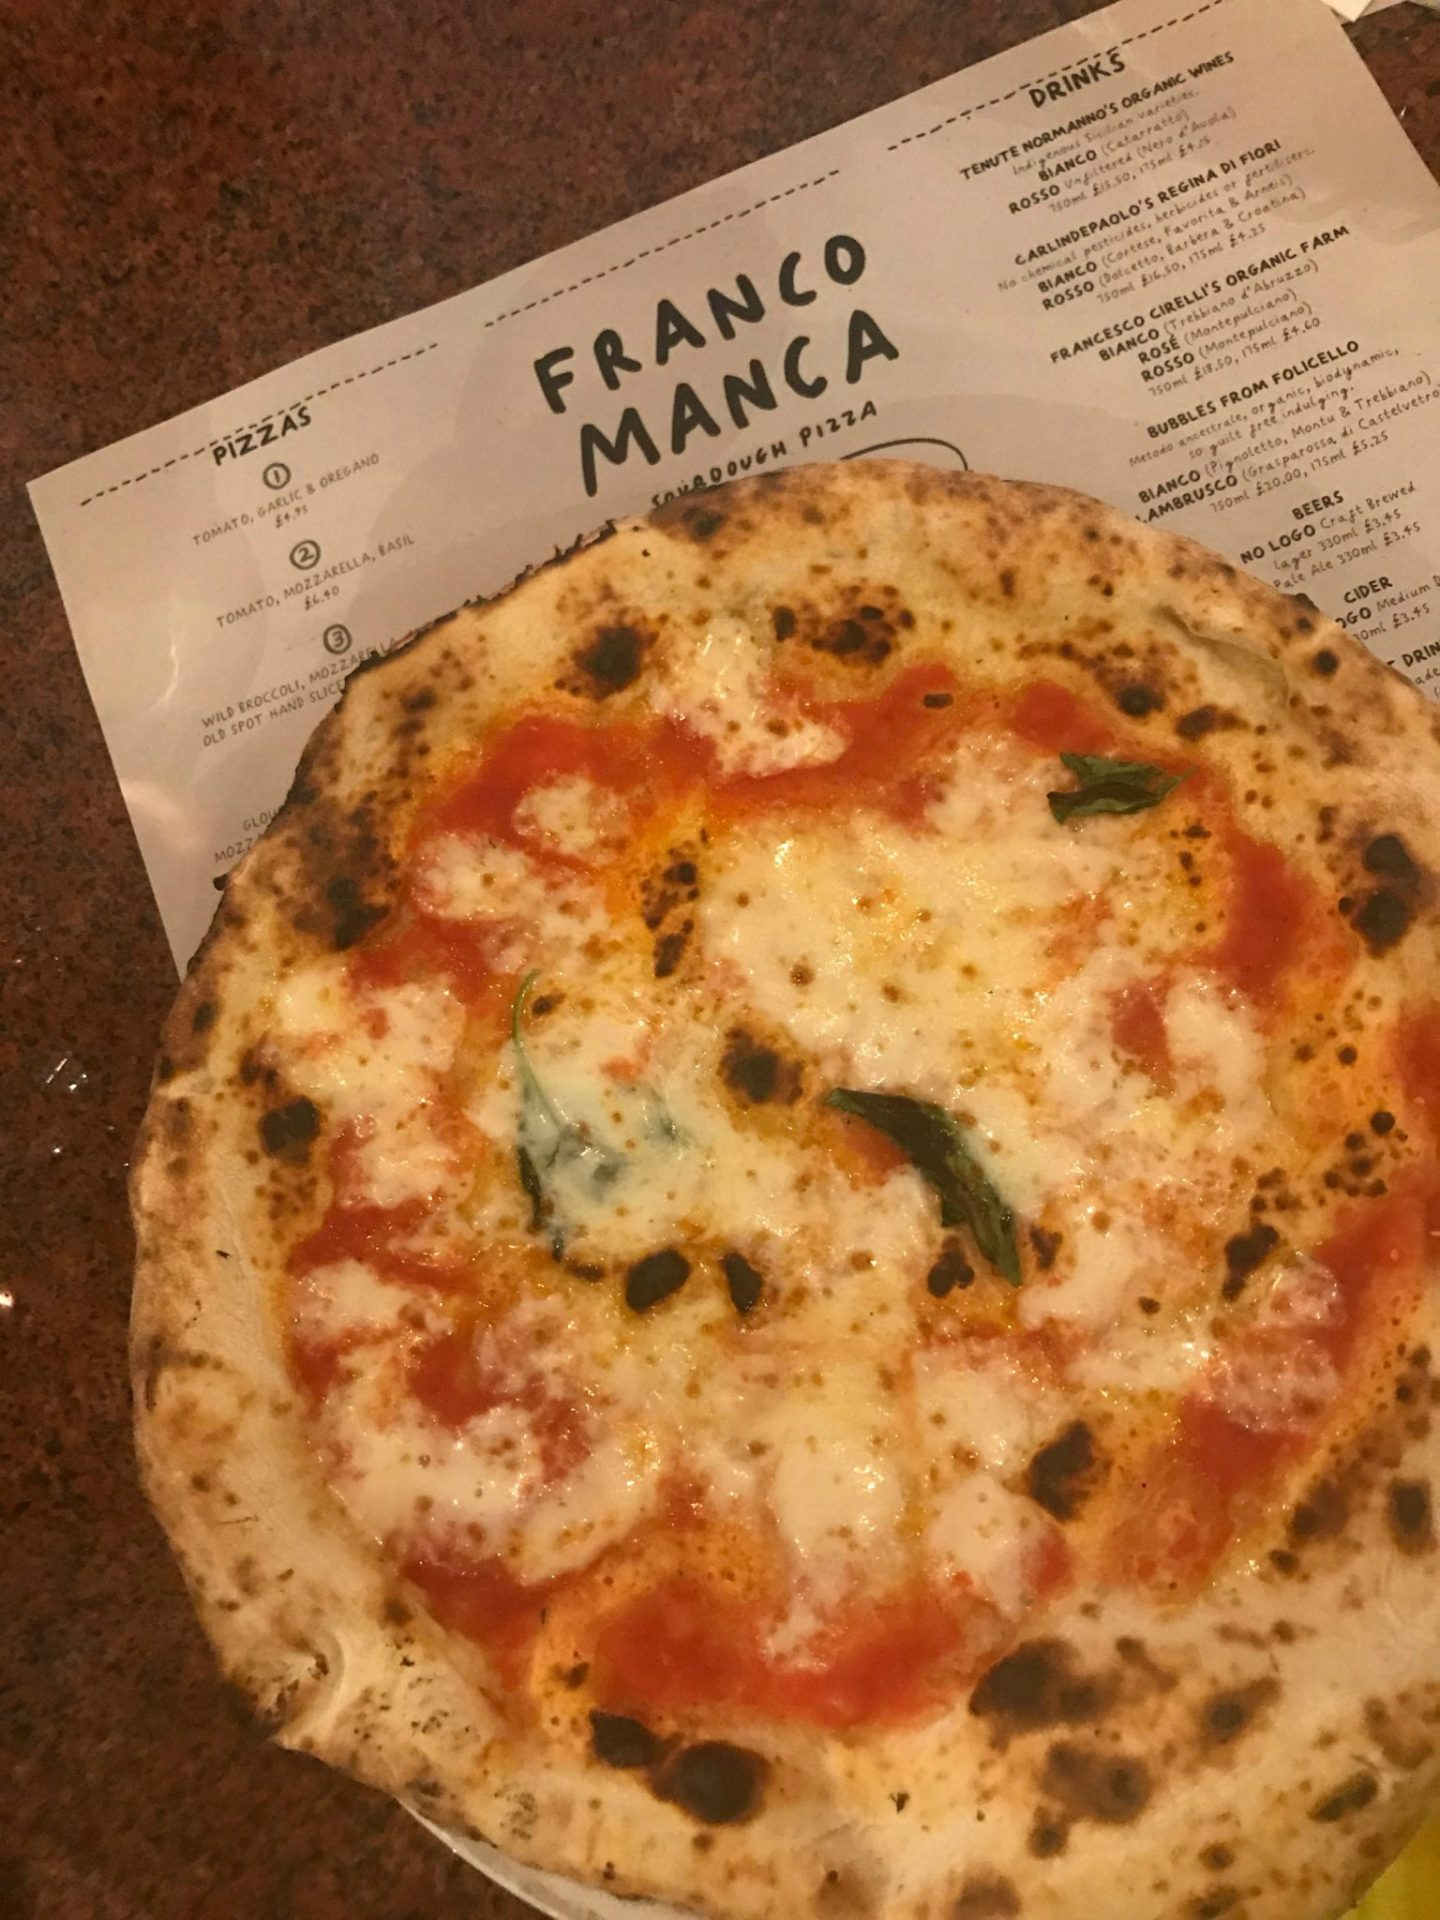 Franco Manca – Sourdough Pizza in London